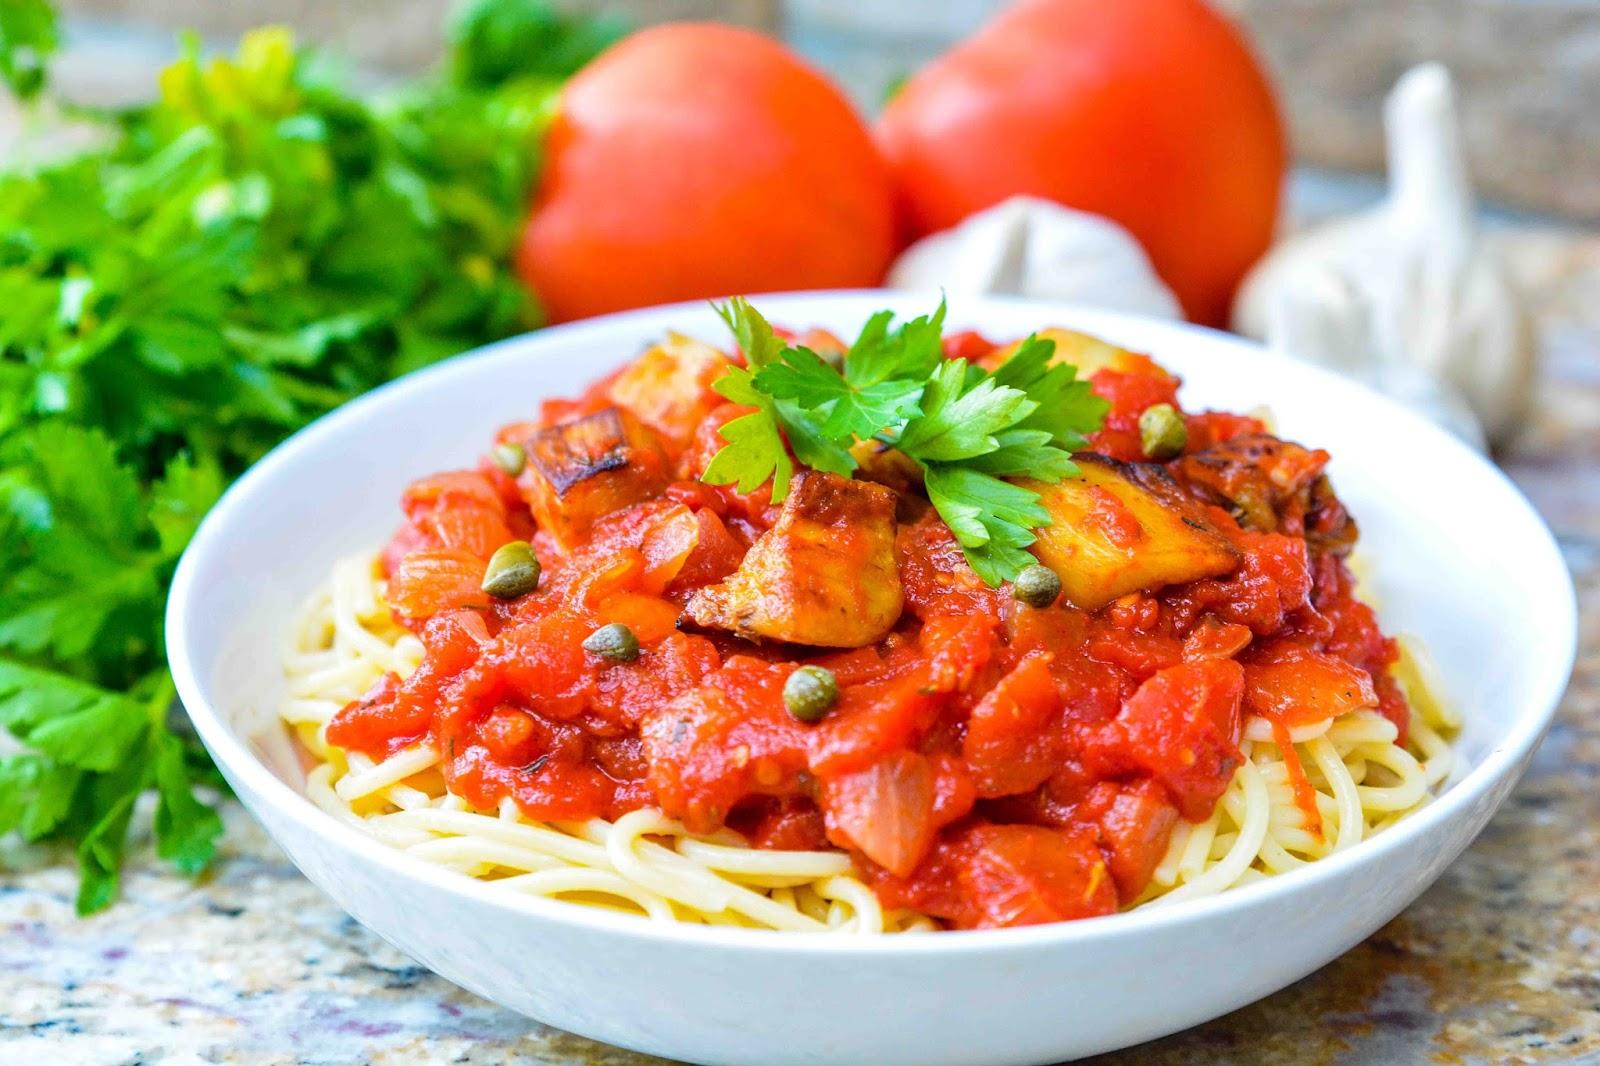 Spaghetti Marinara with Eggplant